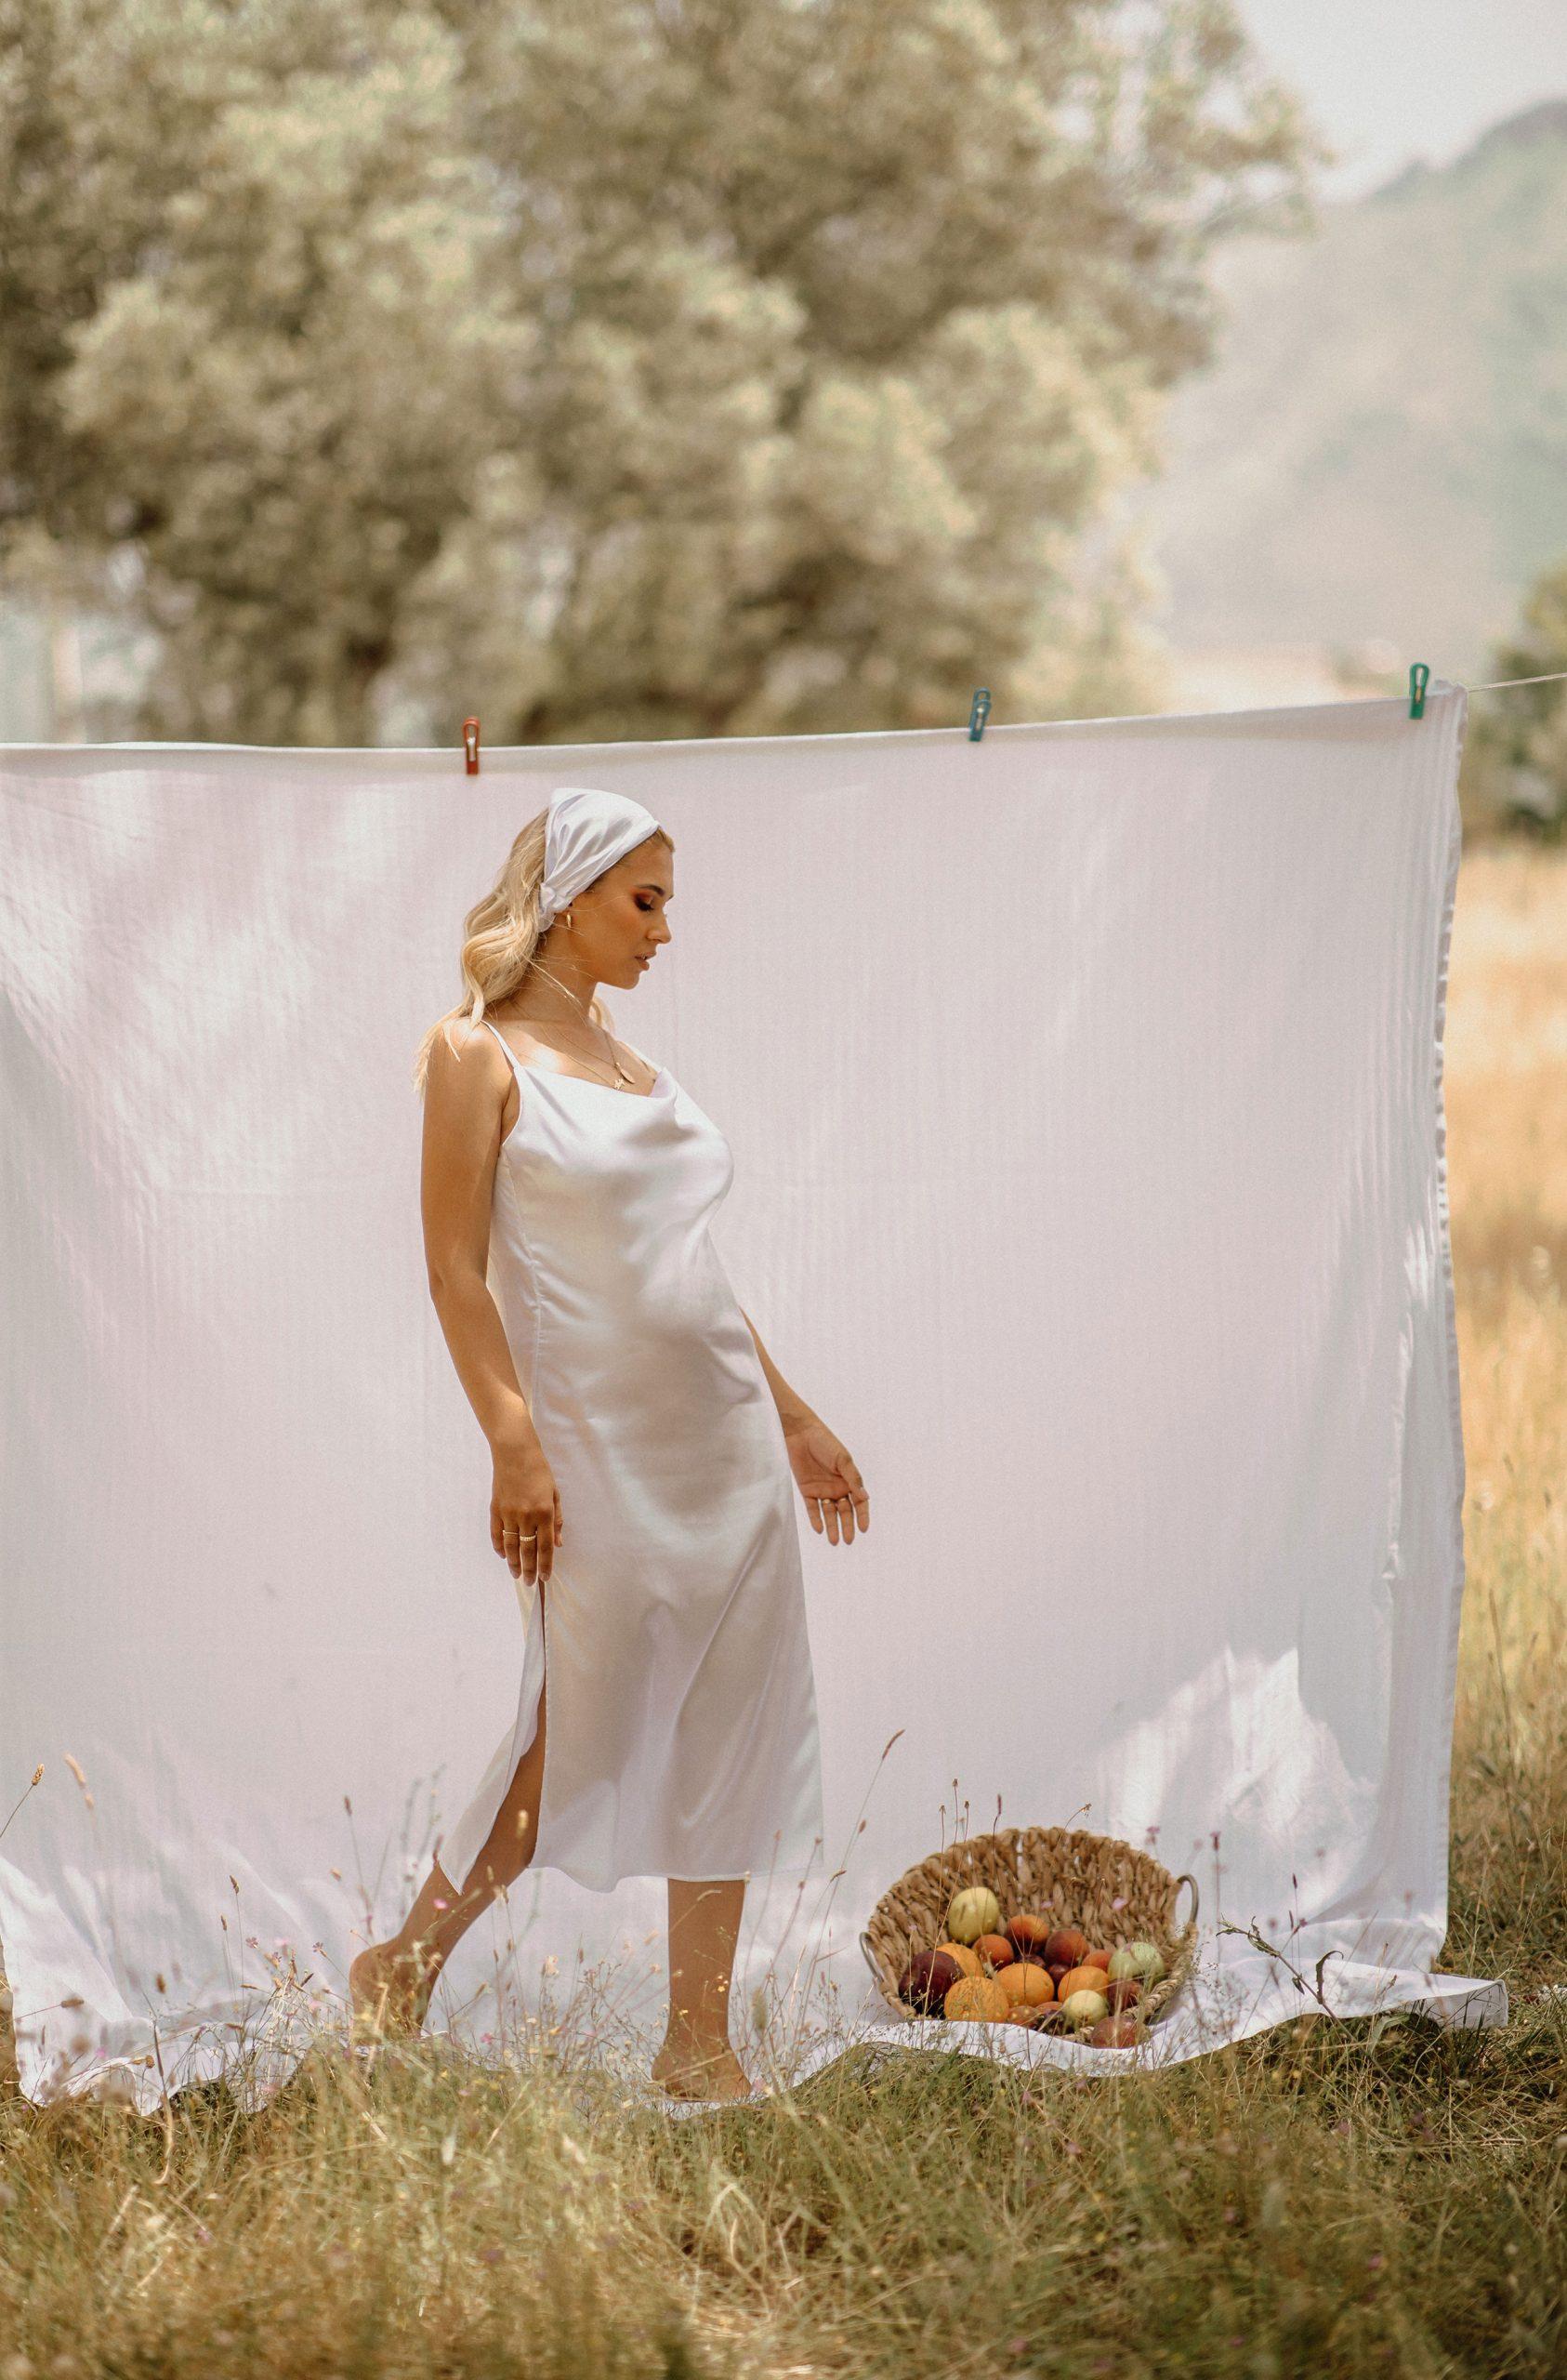 Summer clothesline photoshoot